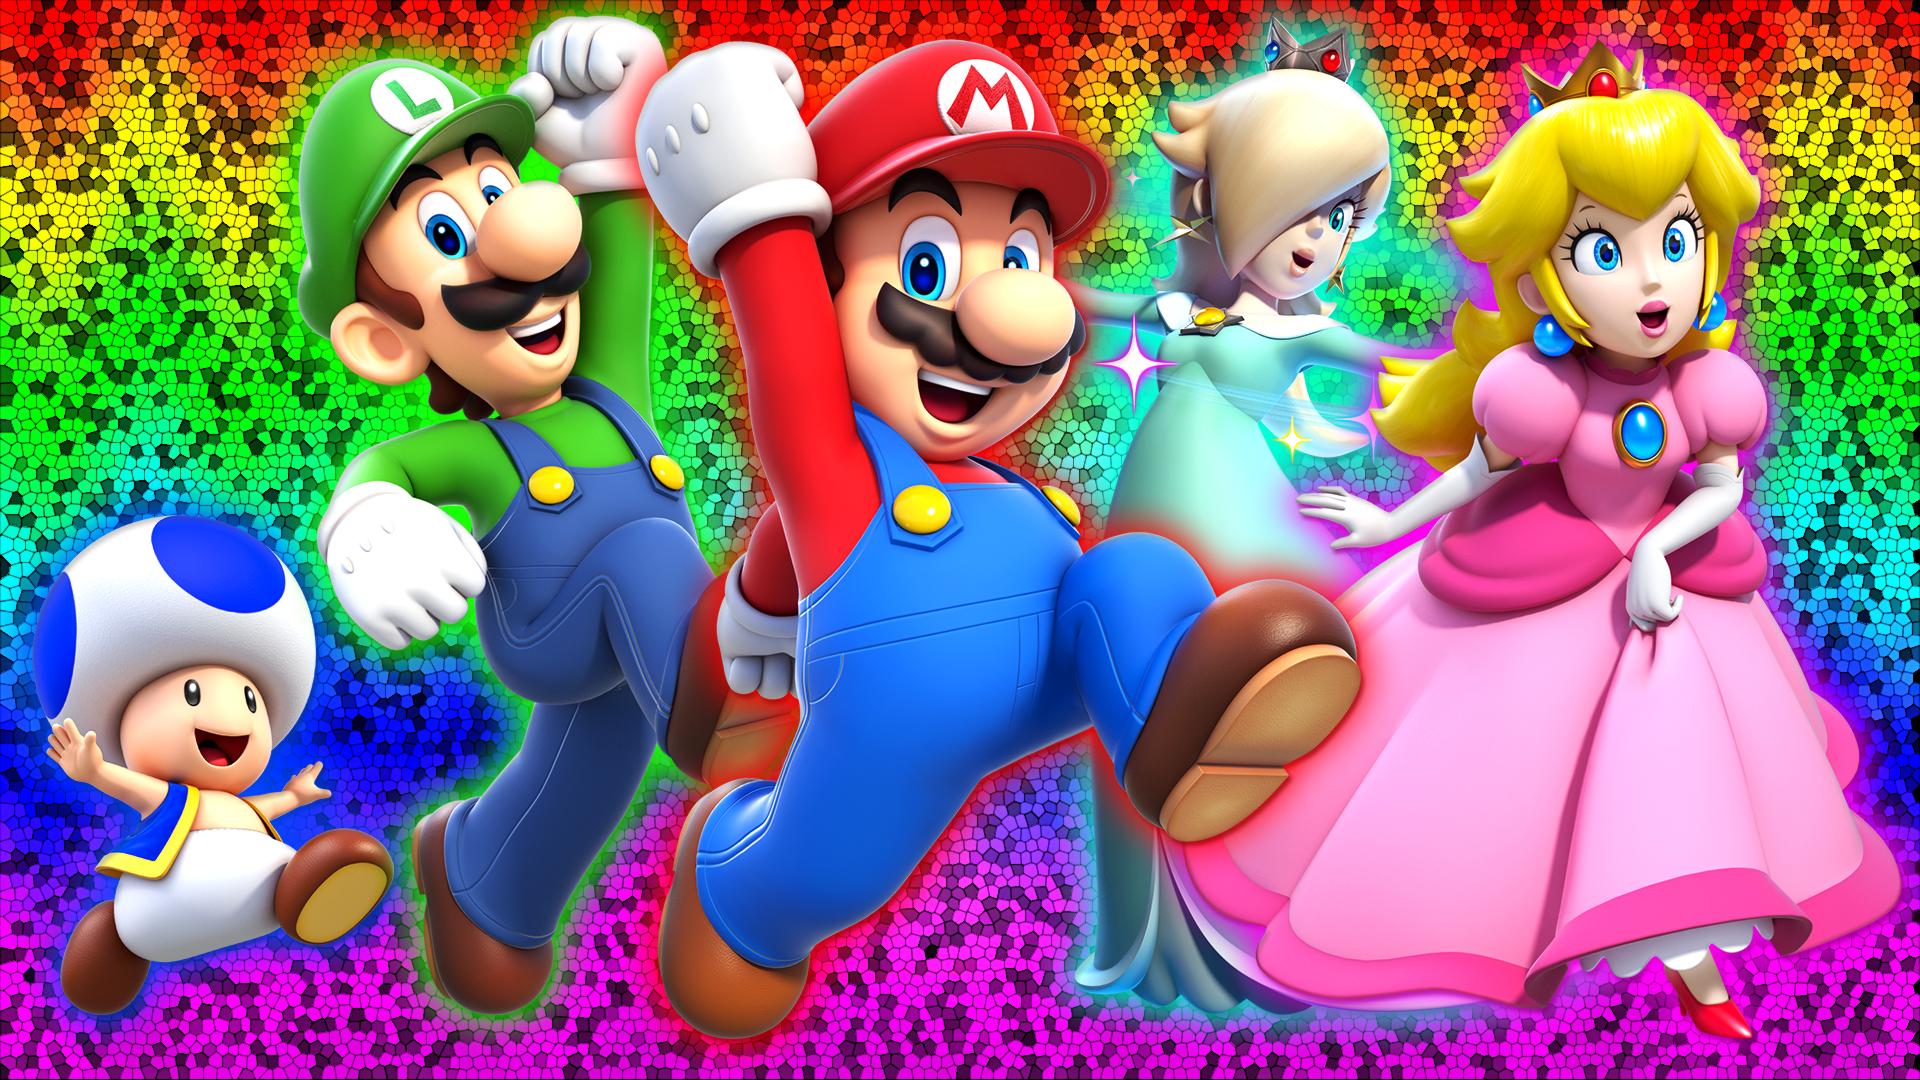 Super Mario 3D World Wallpaper by Glench on DeviantArt